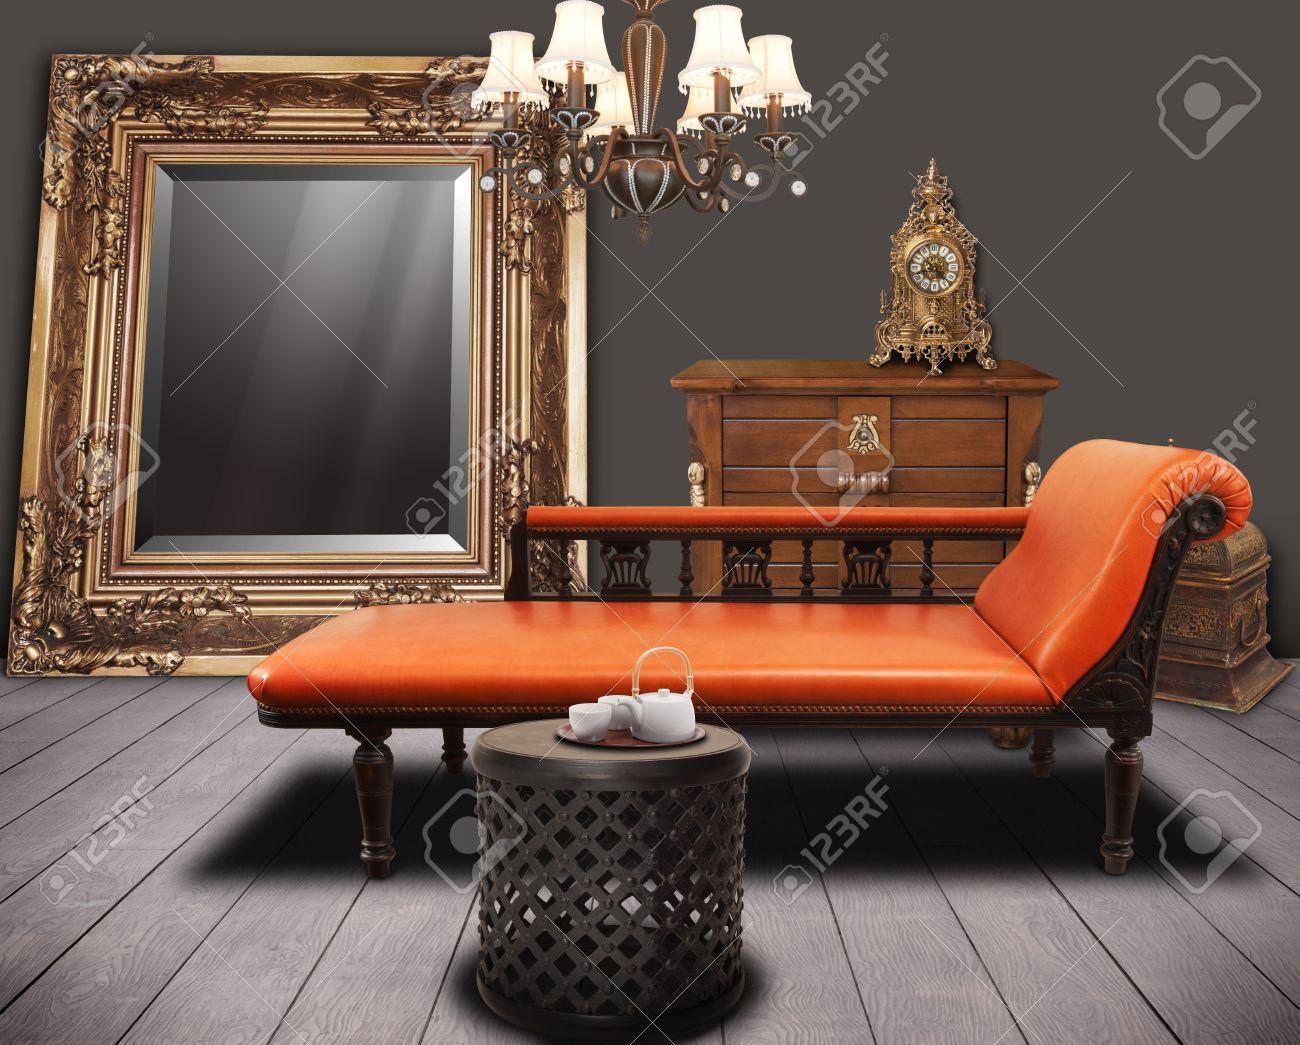 Vintage Livingroom Vintage Furnitures Decorated In Living Room Stock Photo  Picture